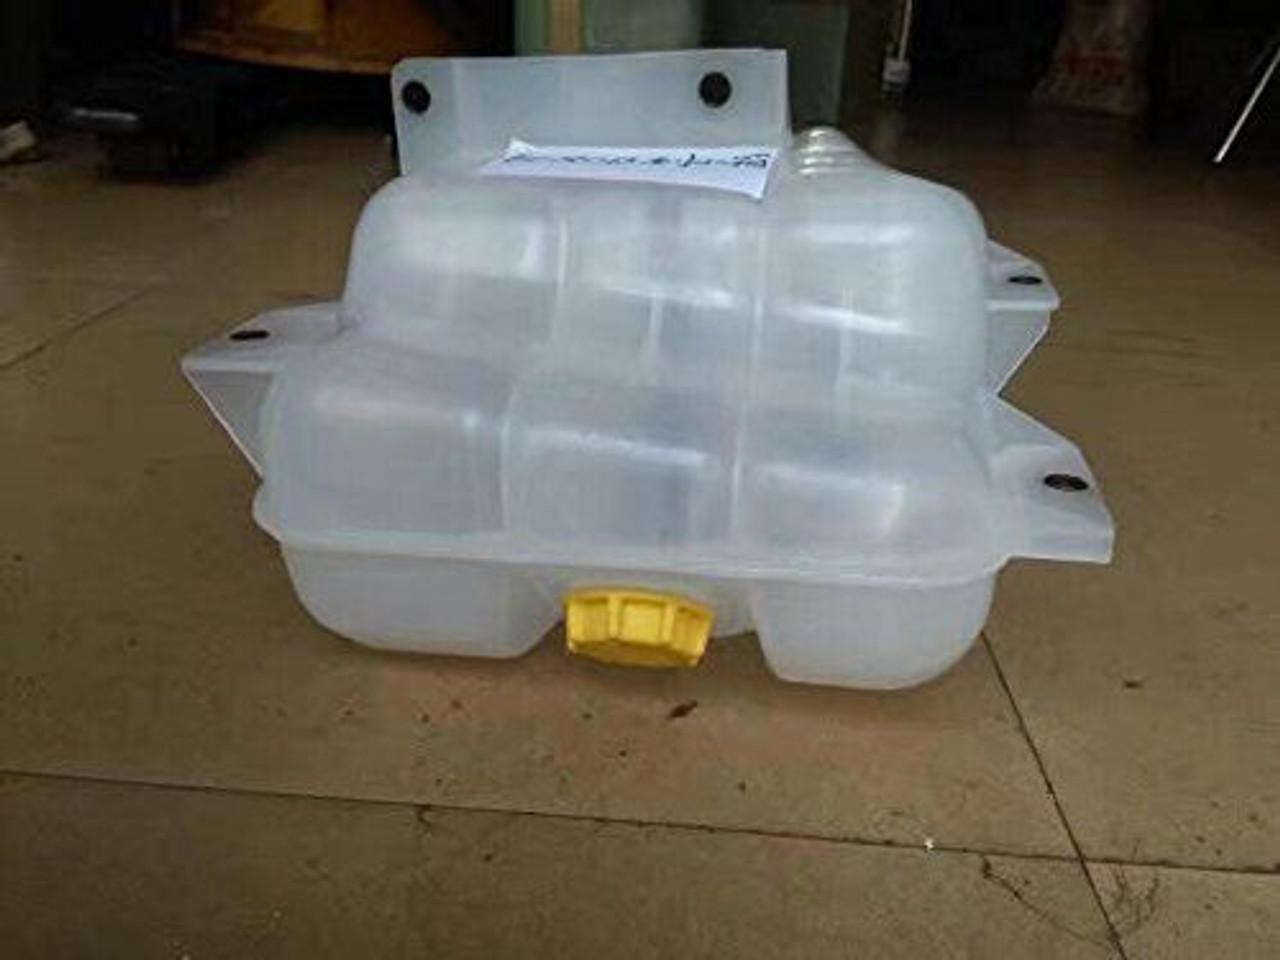 20880612 TANK WATER FITS FOR VOLVO EC360B EC330B EC460B,NEW VOE20880612